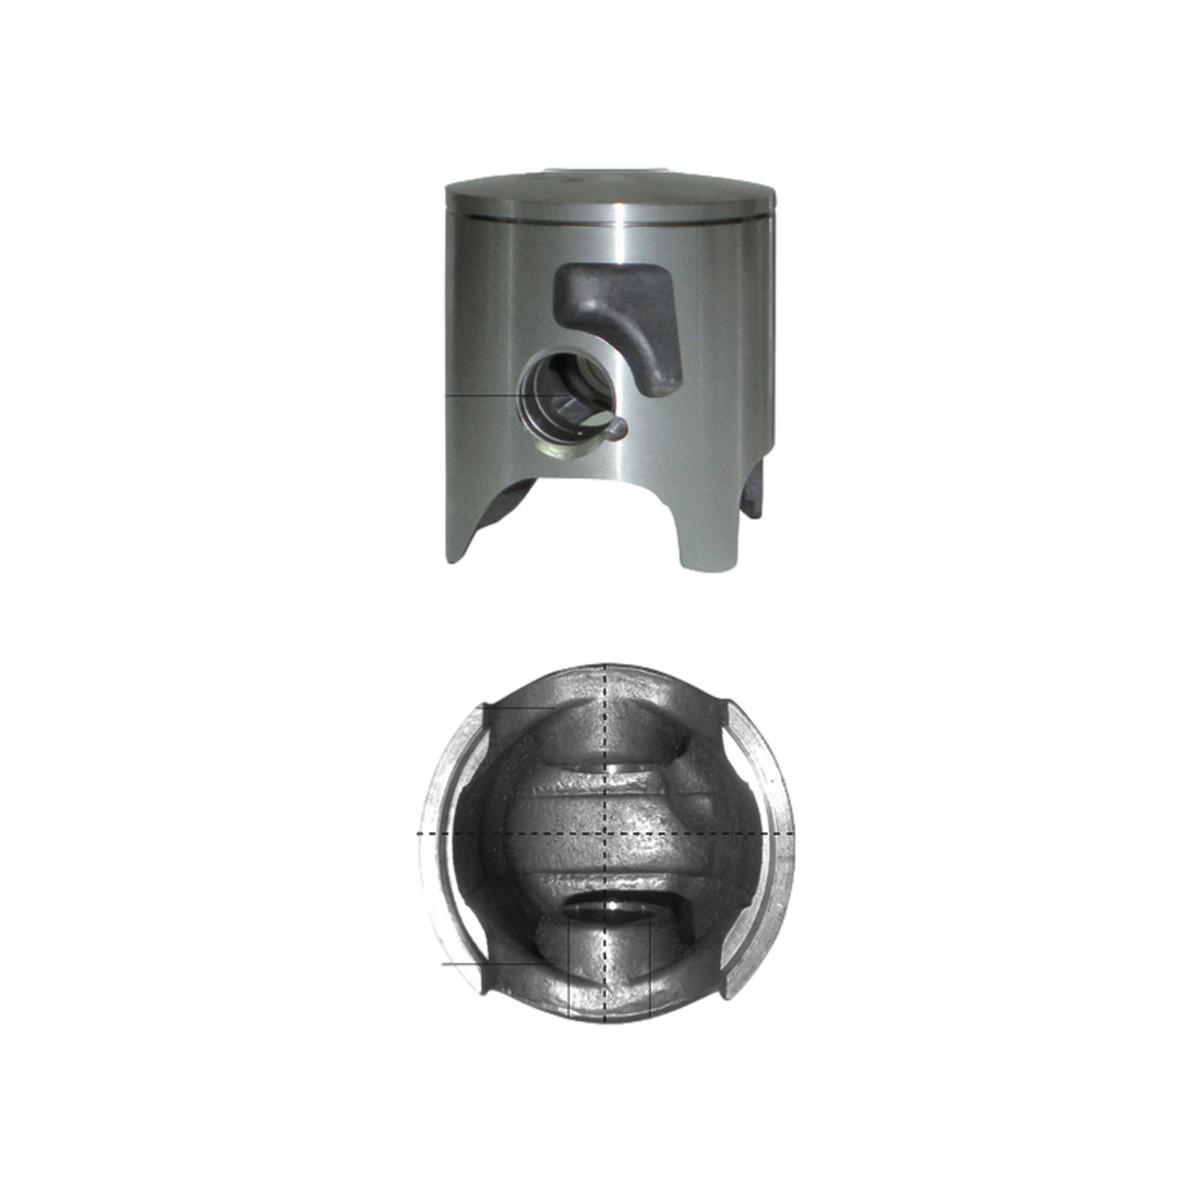 Piston DERBI Variant PIAGGIO Vespino D.43.5mm à 44.5mm - BARIKIT